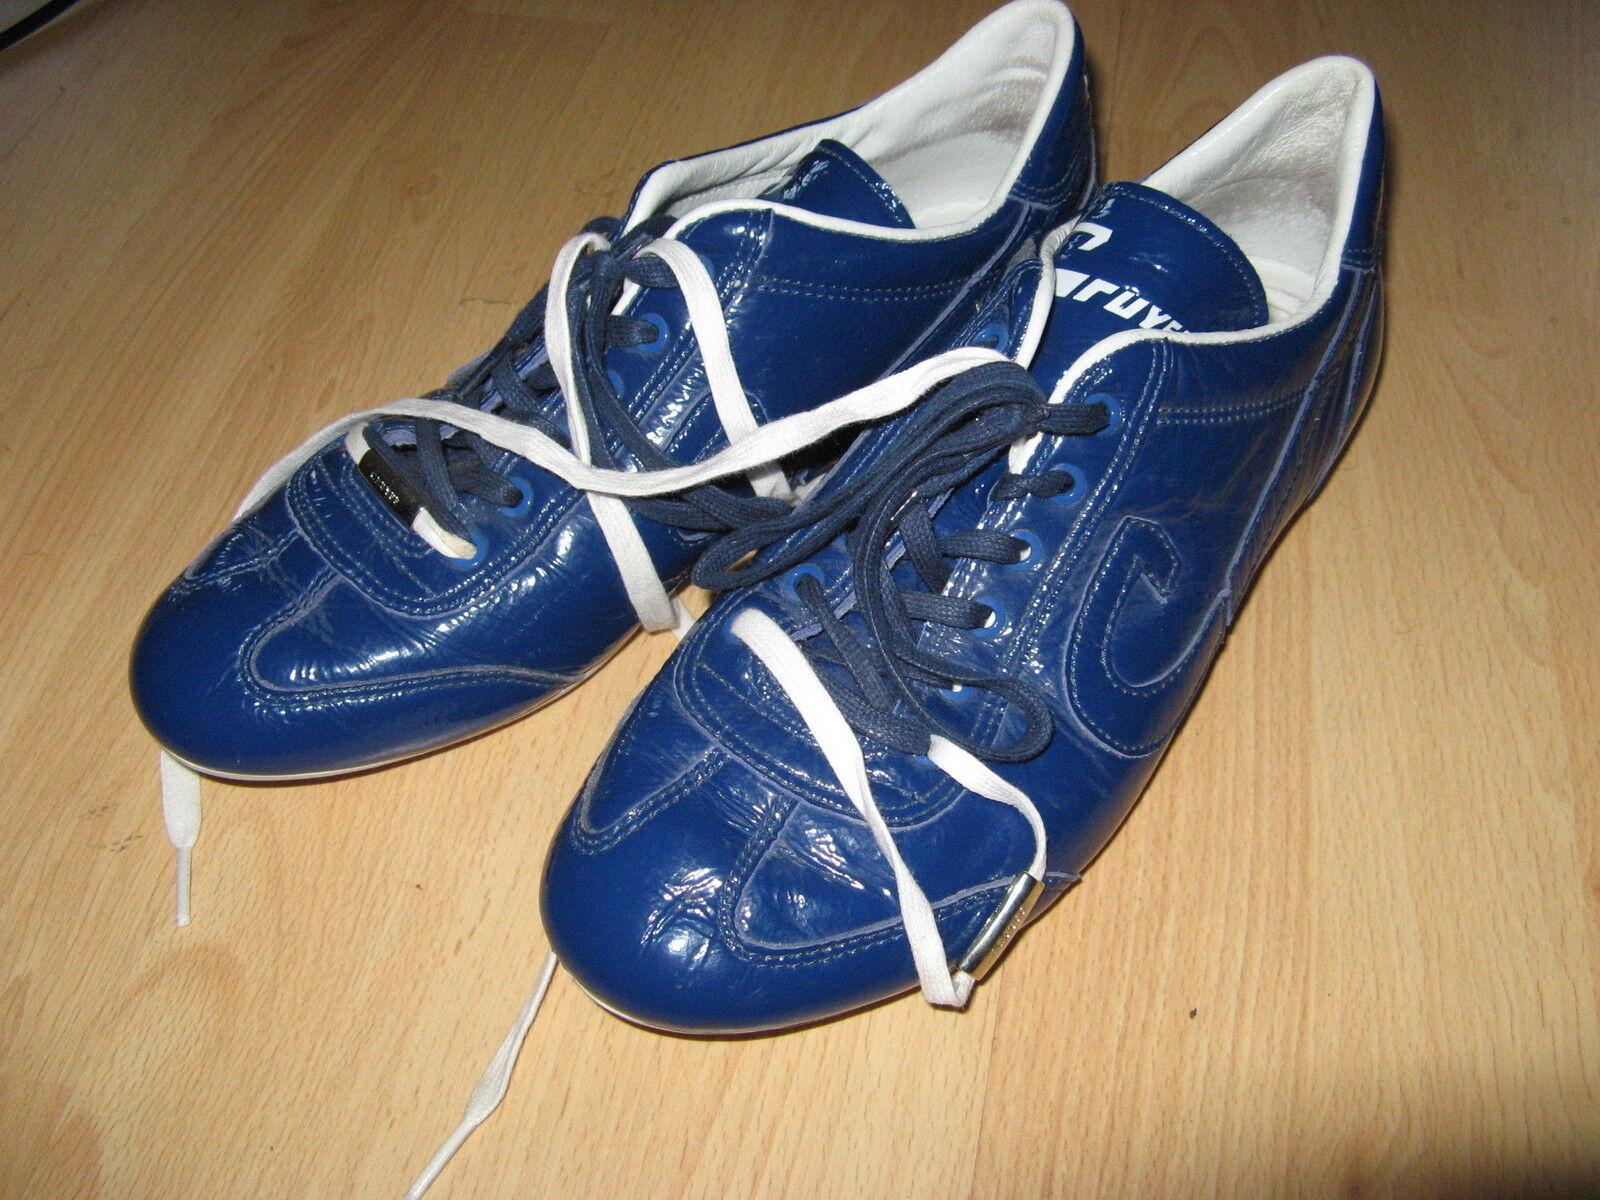 Quasi nuovo blu CRUYFF Vanenburg Recopa Pelle Ginnastica 9 EU Scarpe classiche da uomo